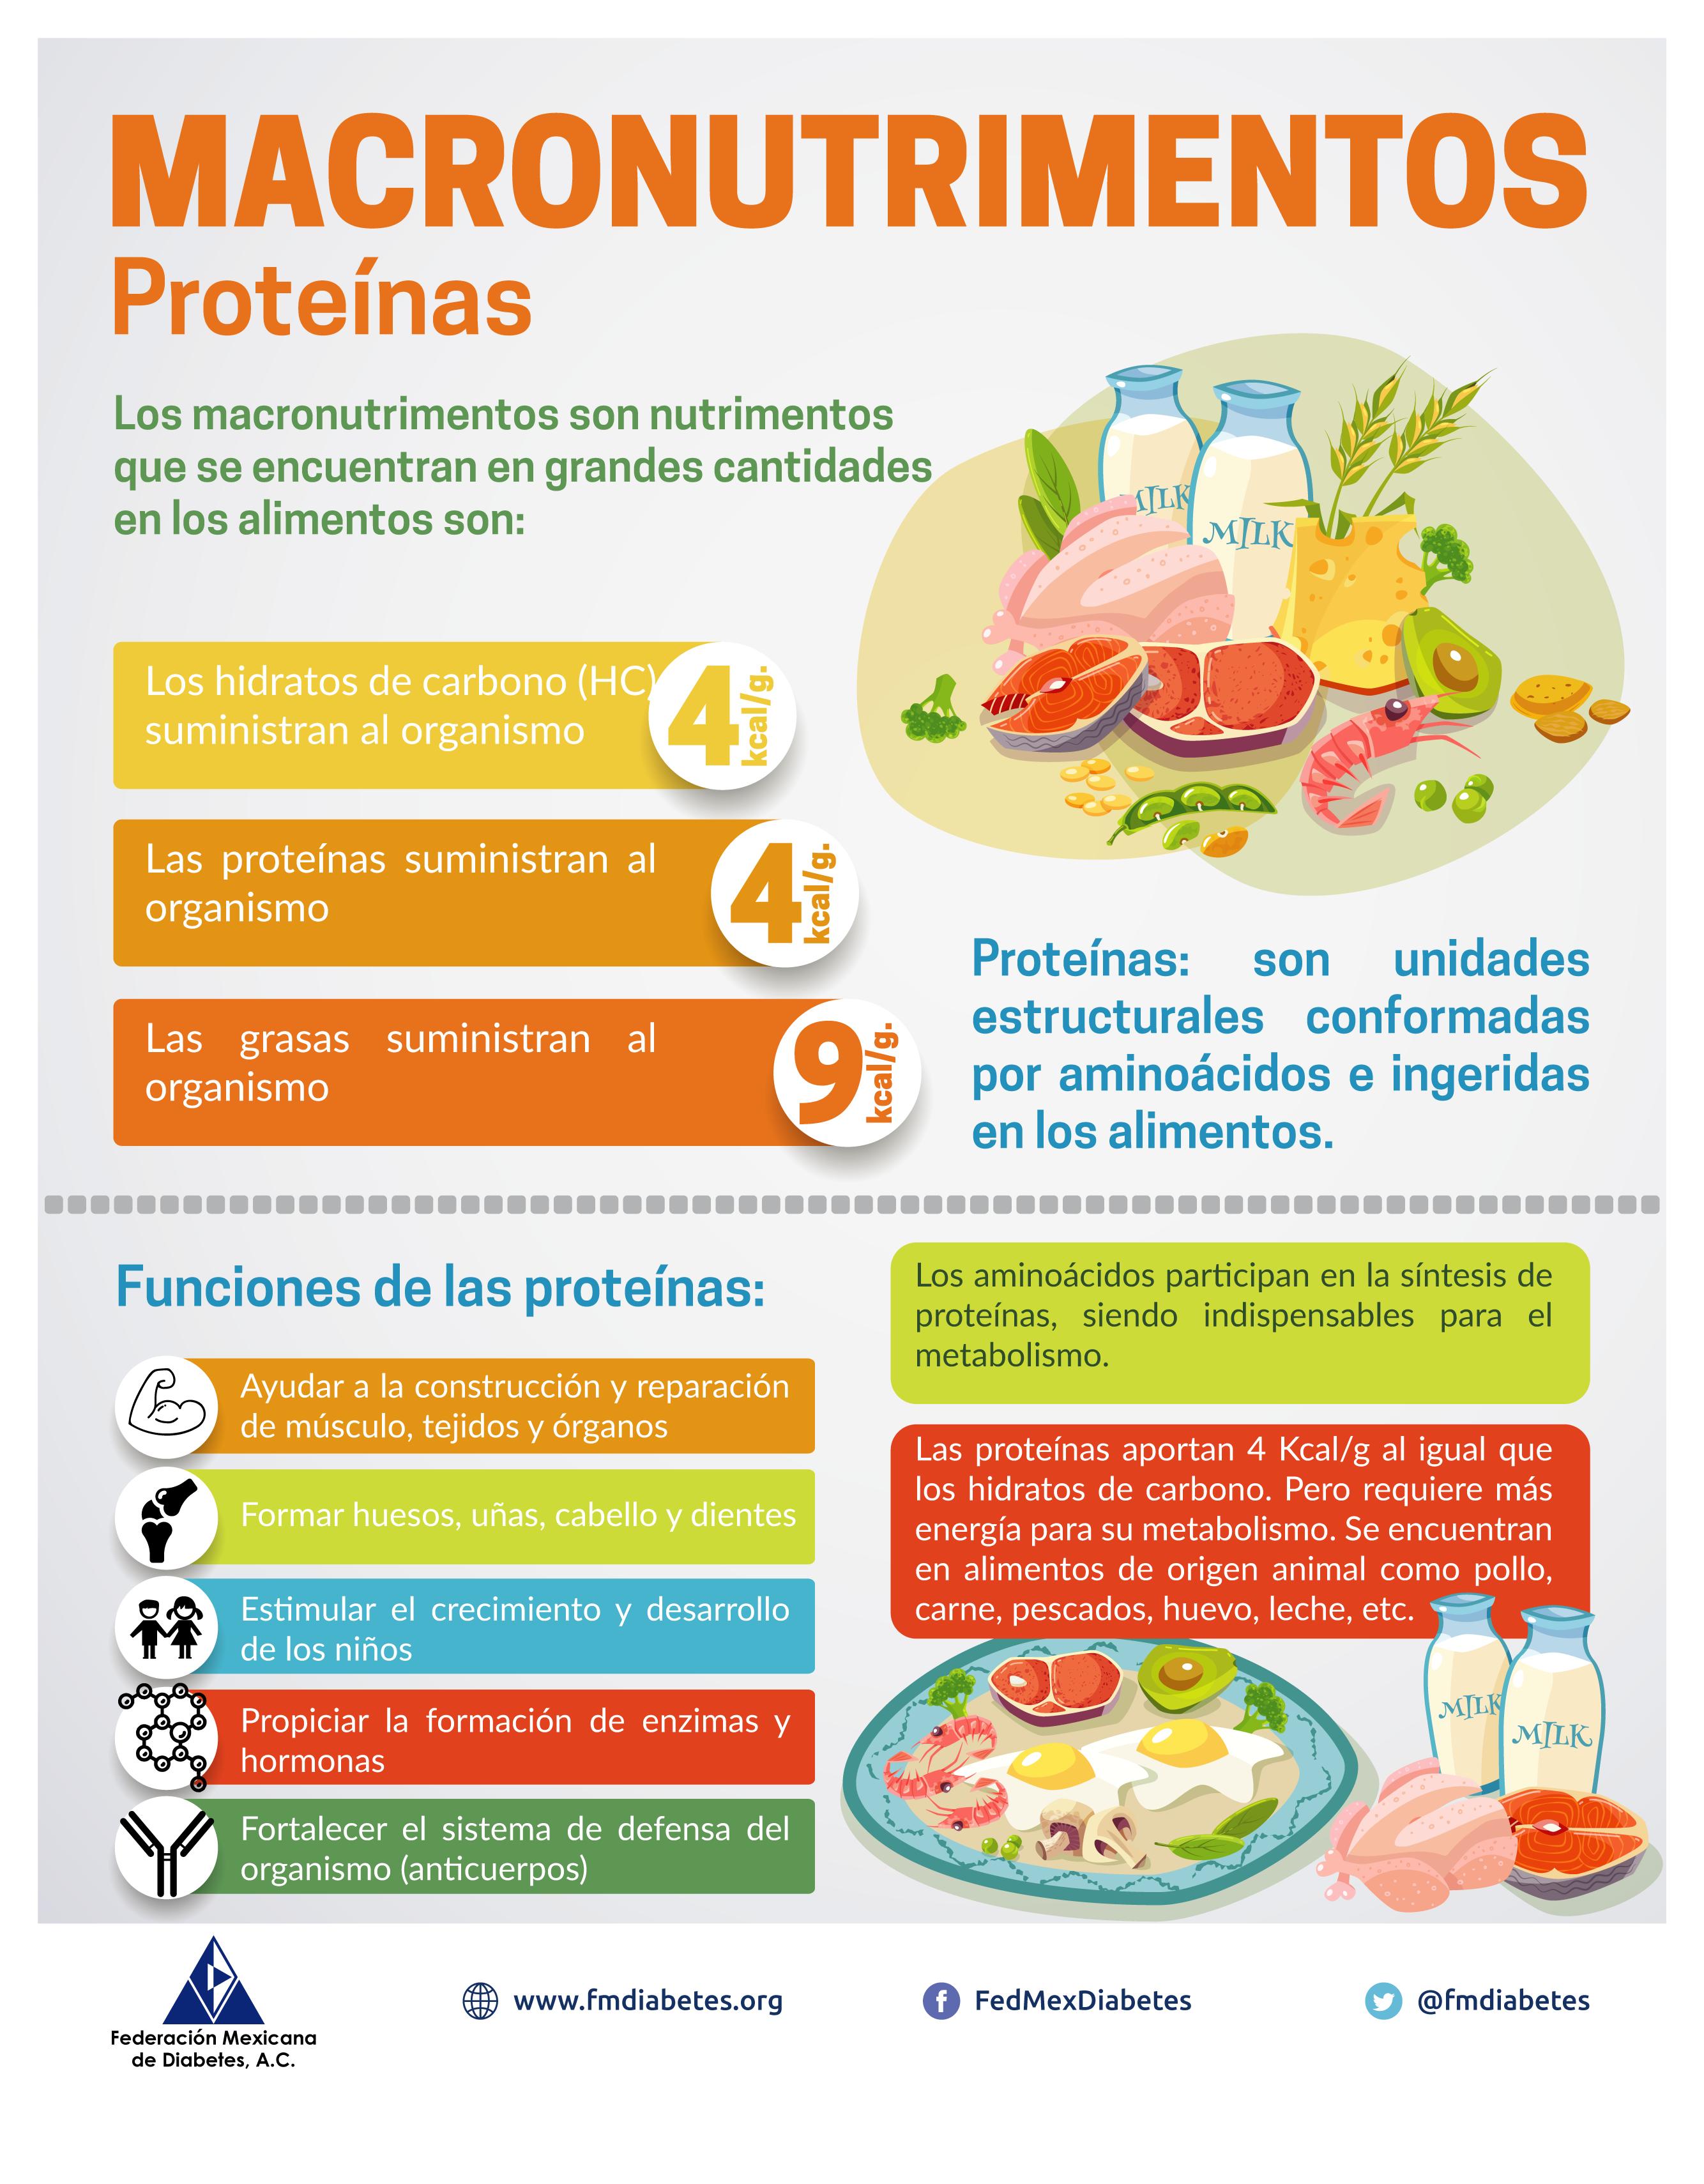 Macronutrimentos – Proteínas